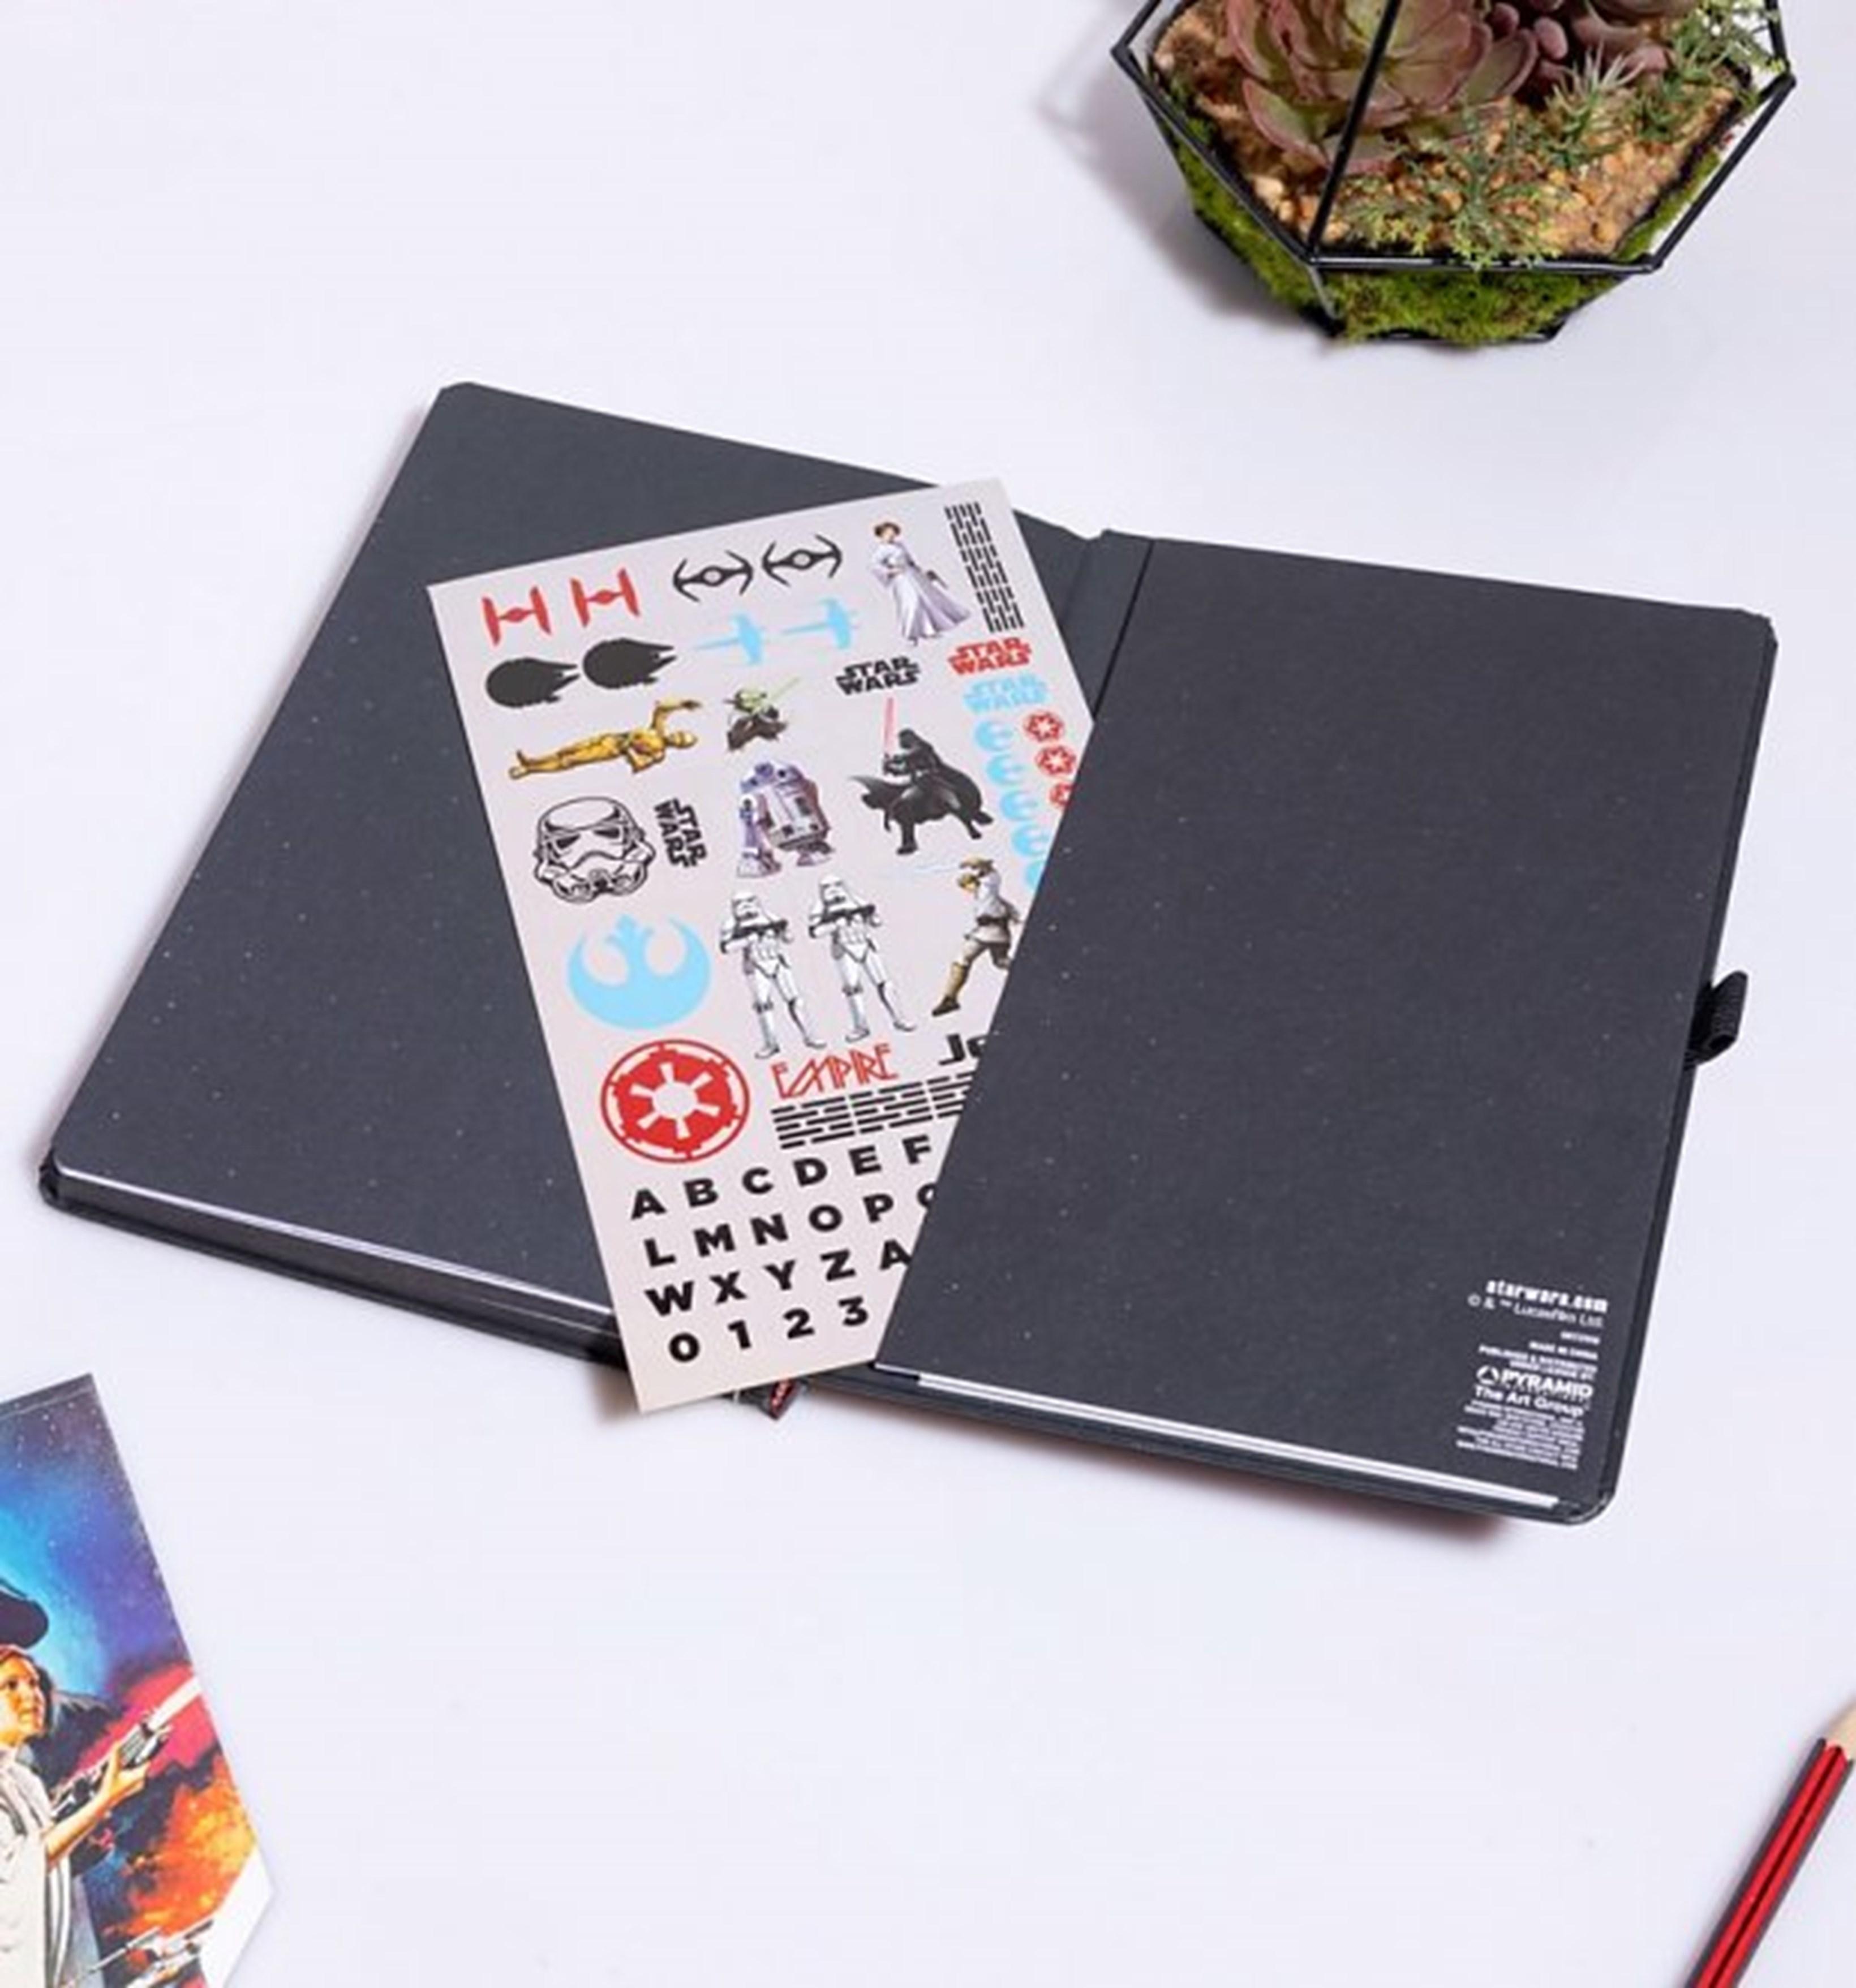 Star Wars (A New Hope) VHS Premium A5 Notebook - 4